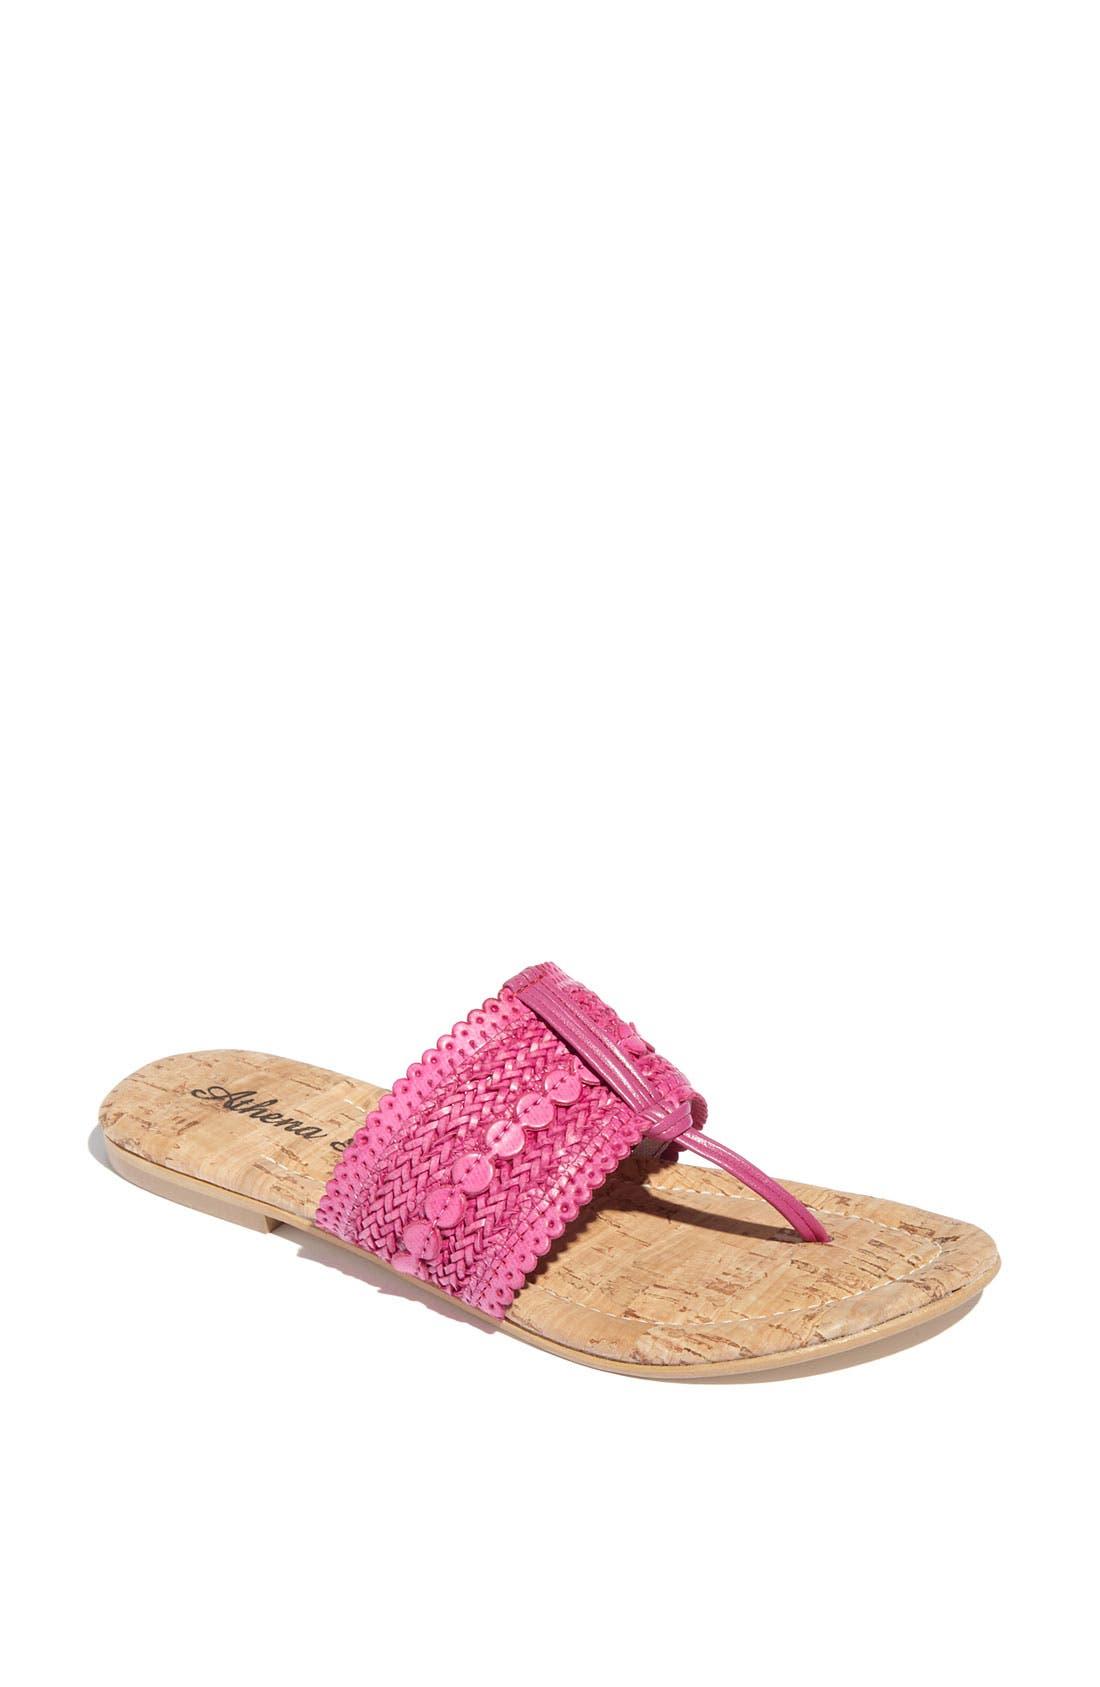 Alternate Image 1 Selected - Athena Alexander 'Malta' Sandal